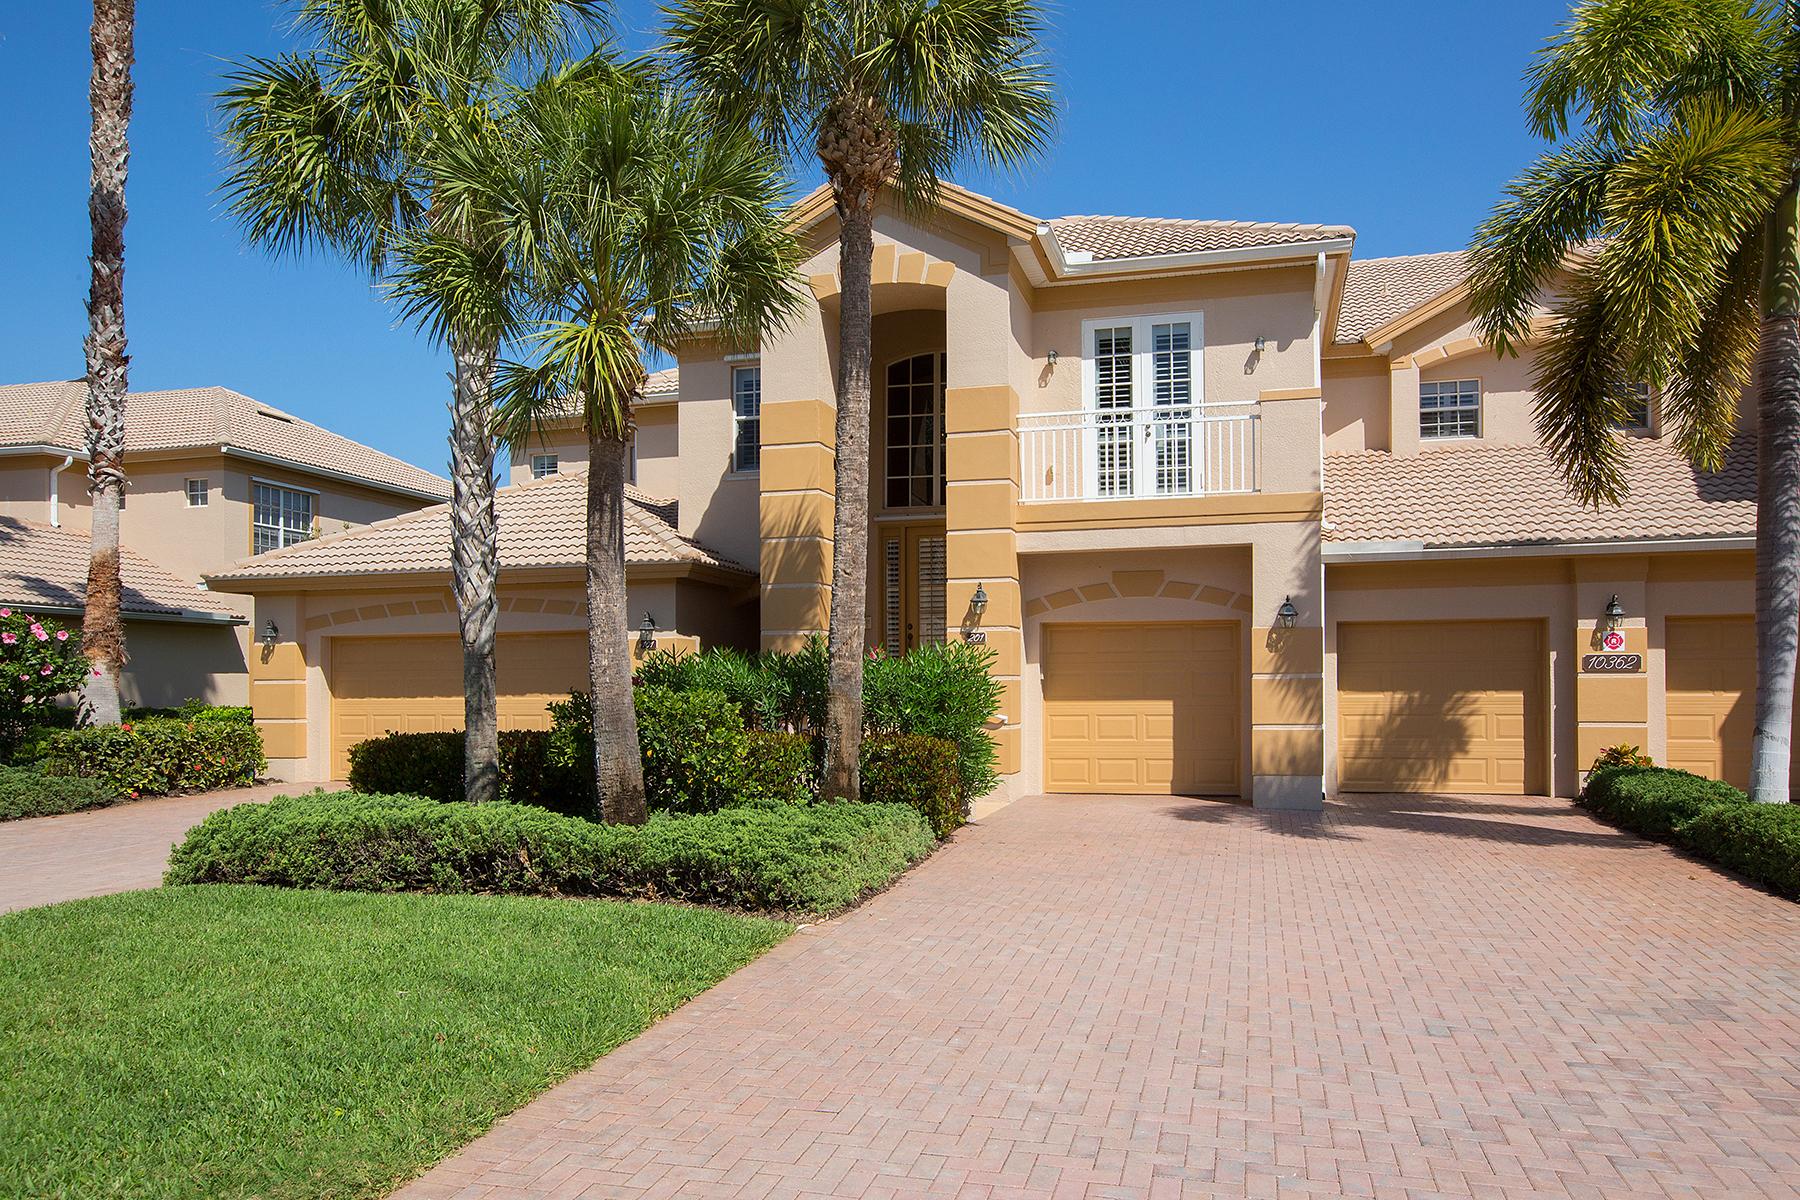 Condomínio para Venda às SHADOW WOOD AT THE BROOKS - OAK HAMMOCK 10362 Autumn Breeze Dr 201 Estero, Florida 34135 Estados Unidos